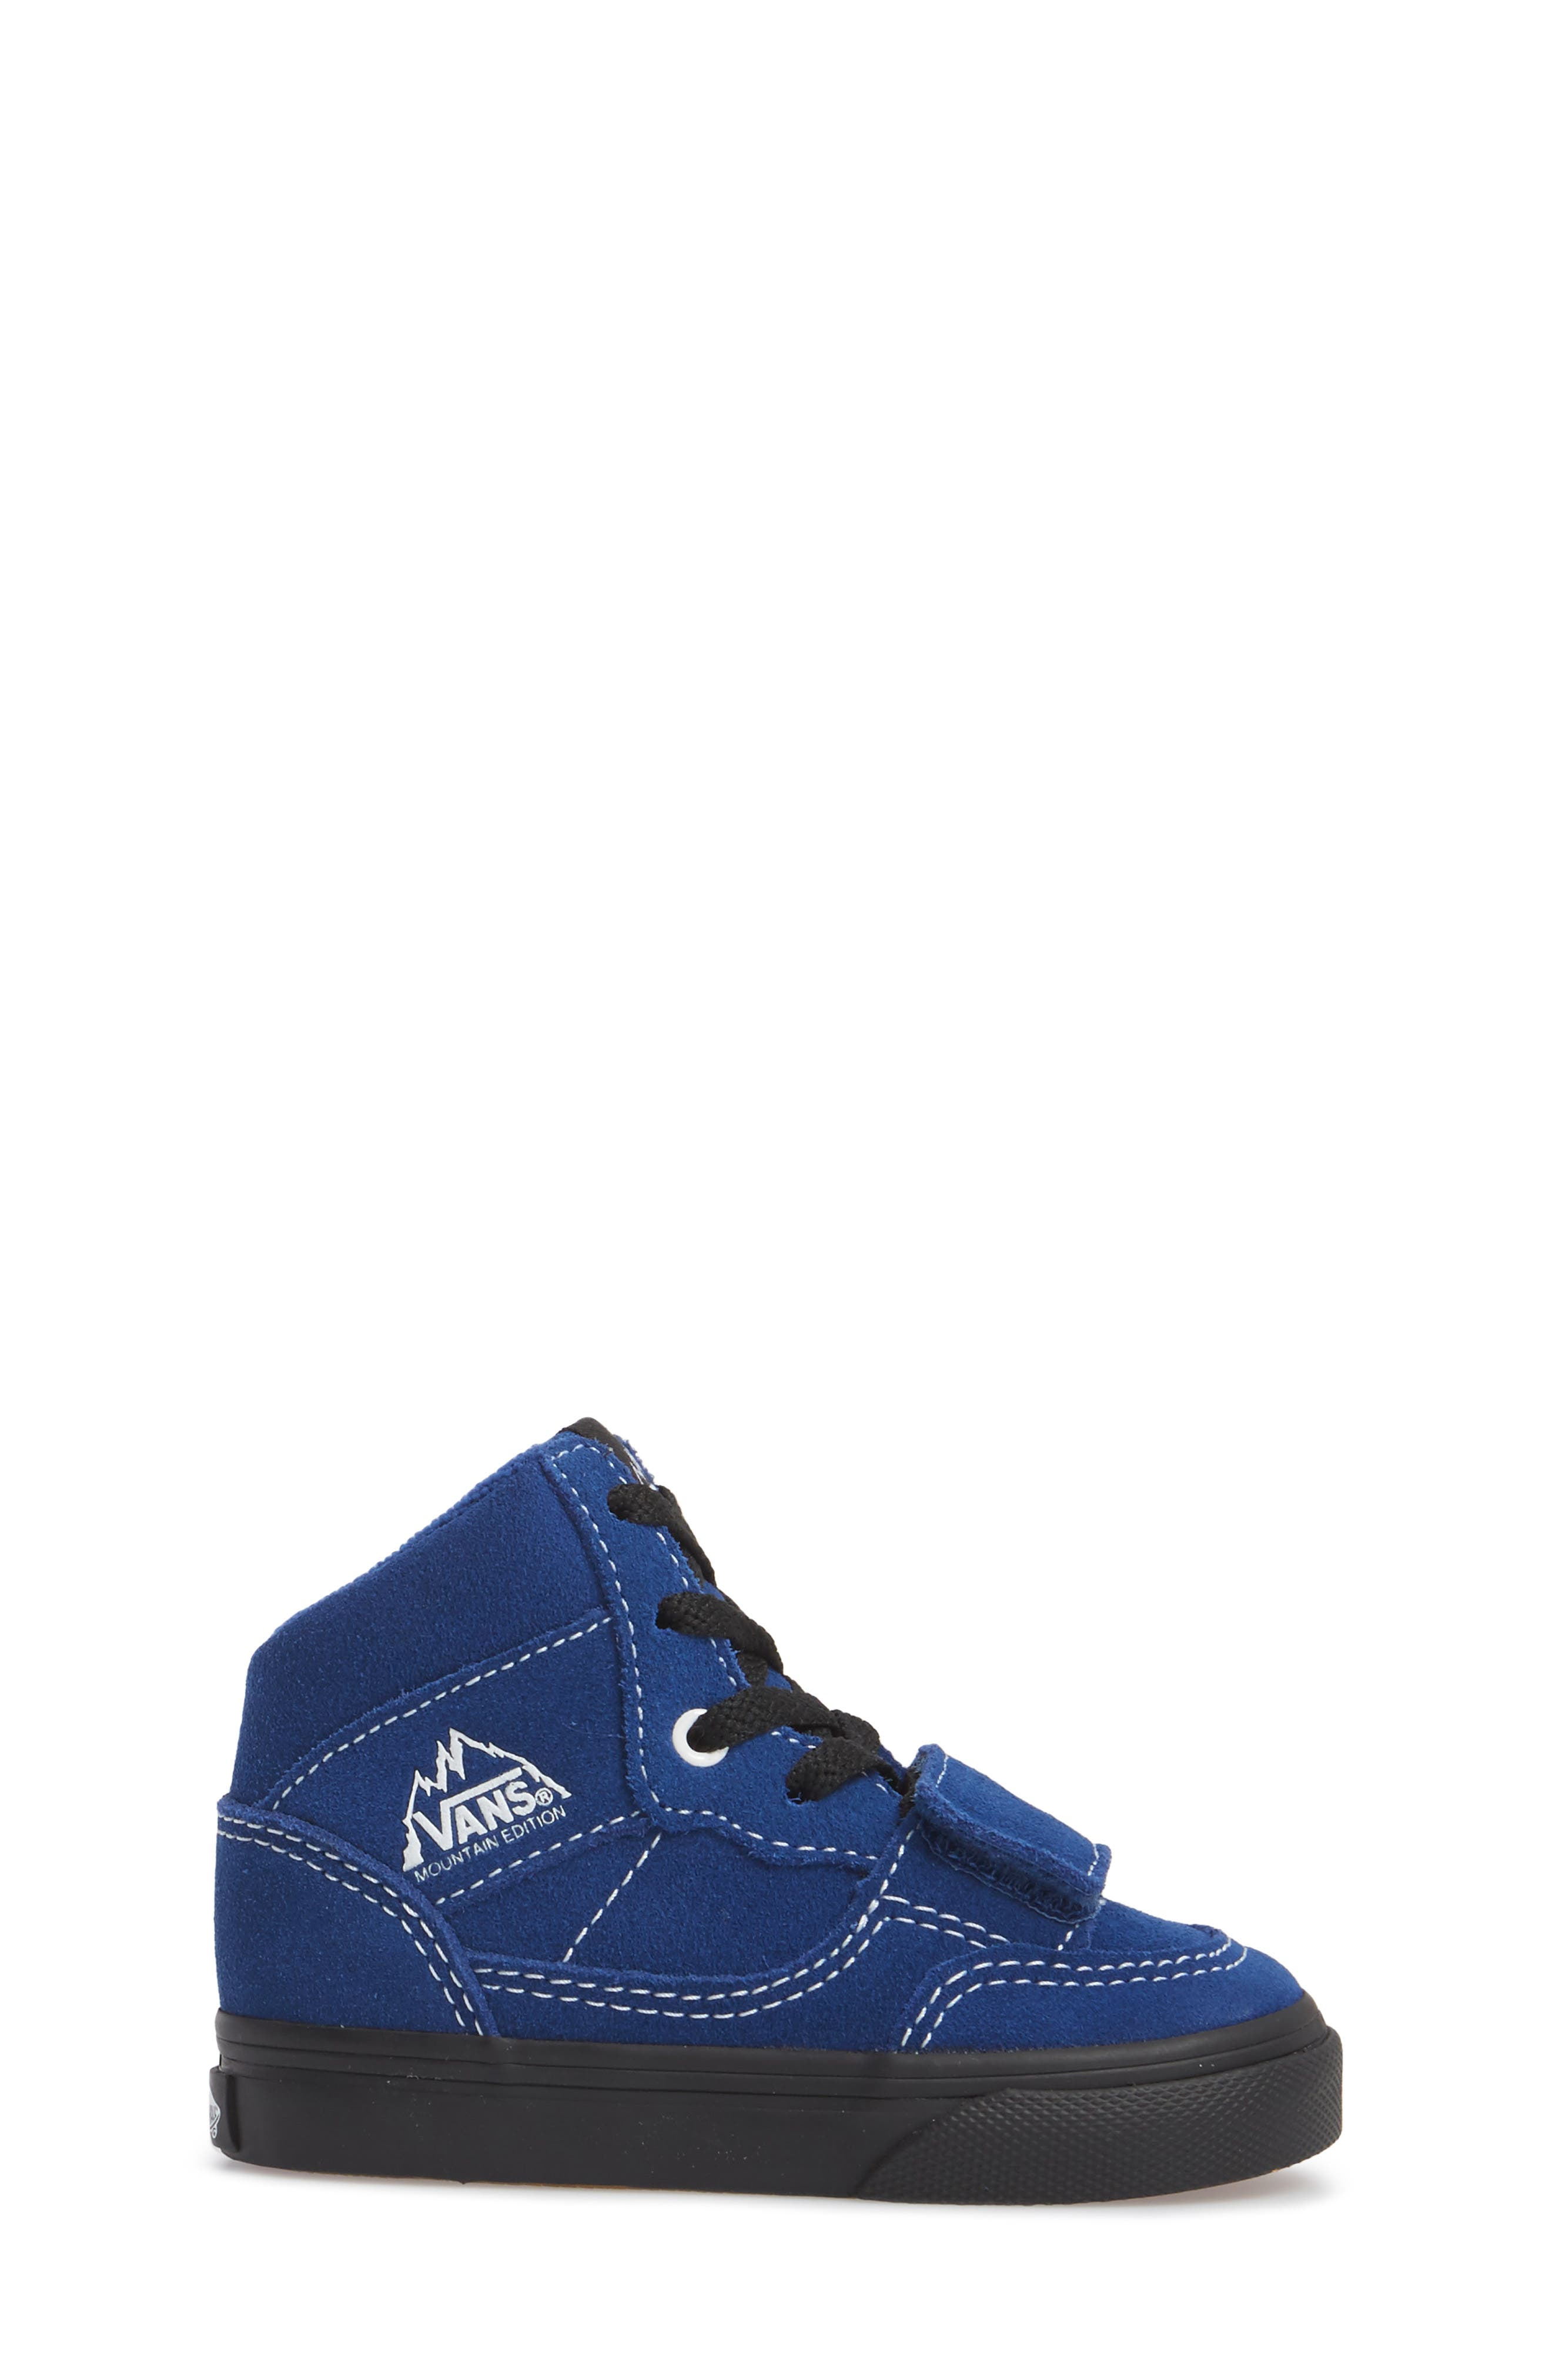 Mountain Edition Mid Top Sneaker,                             Alternate thumbnail 3, color,                             Blue/ Black